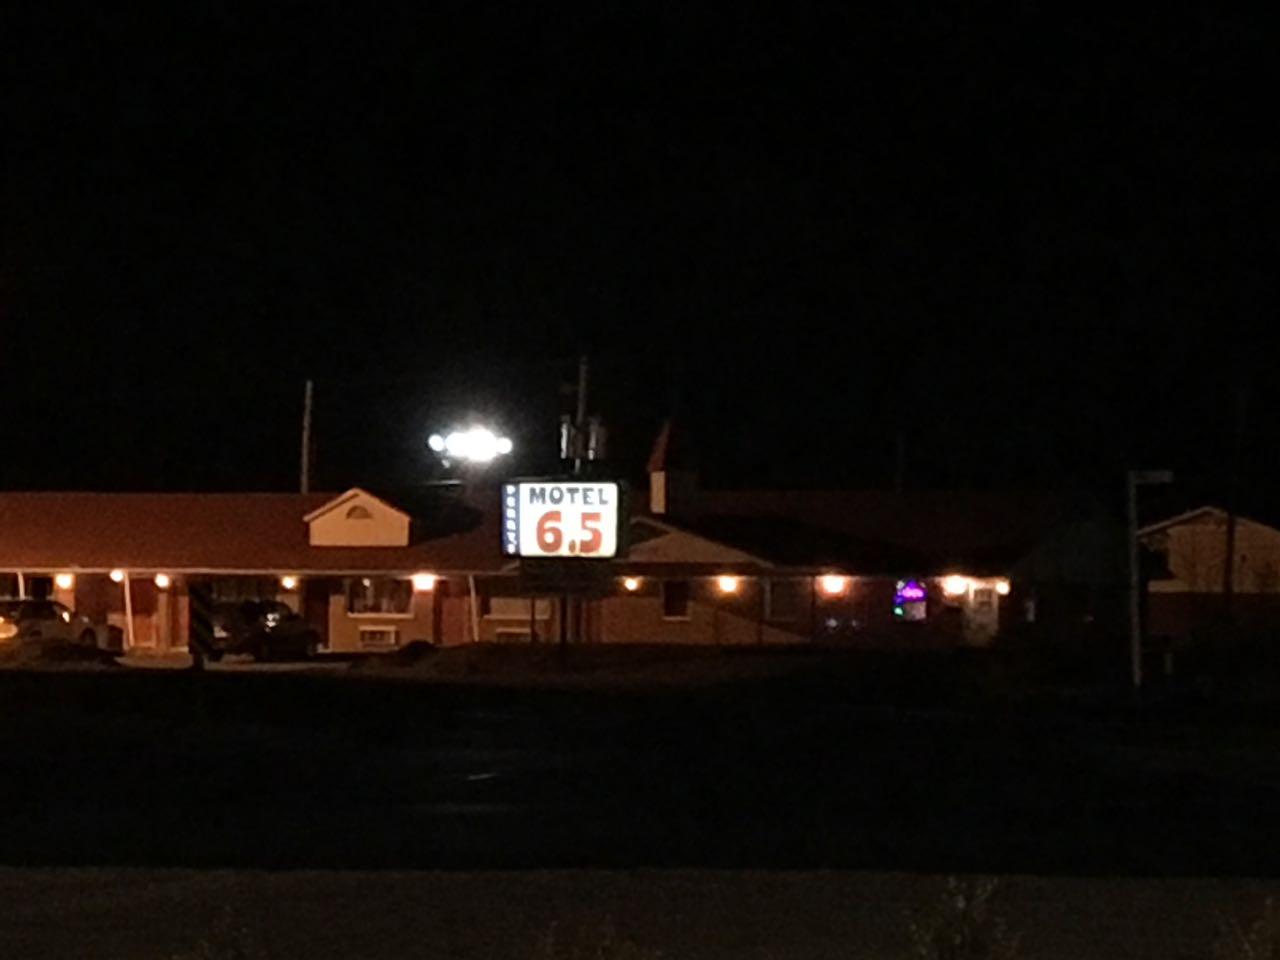 Motel 6.5